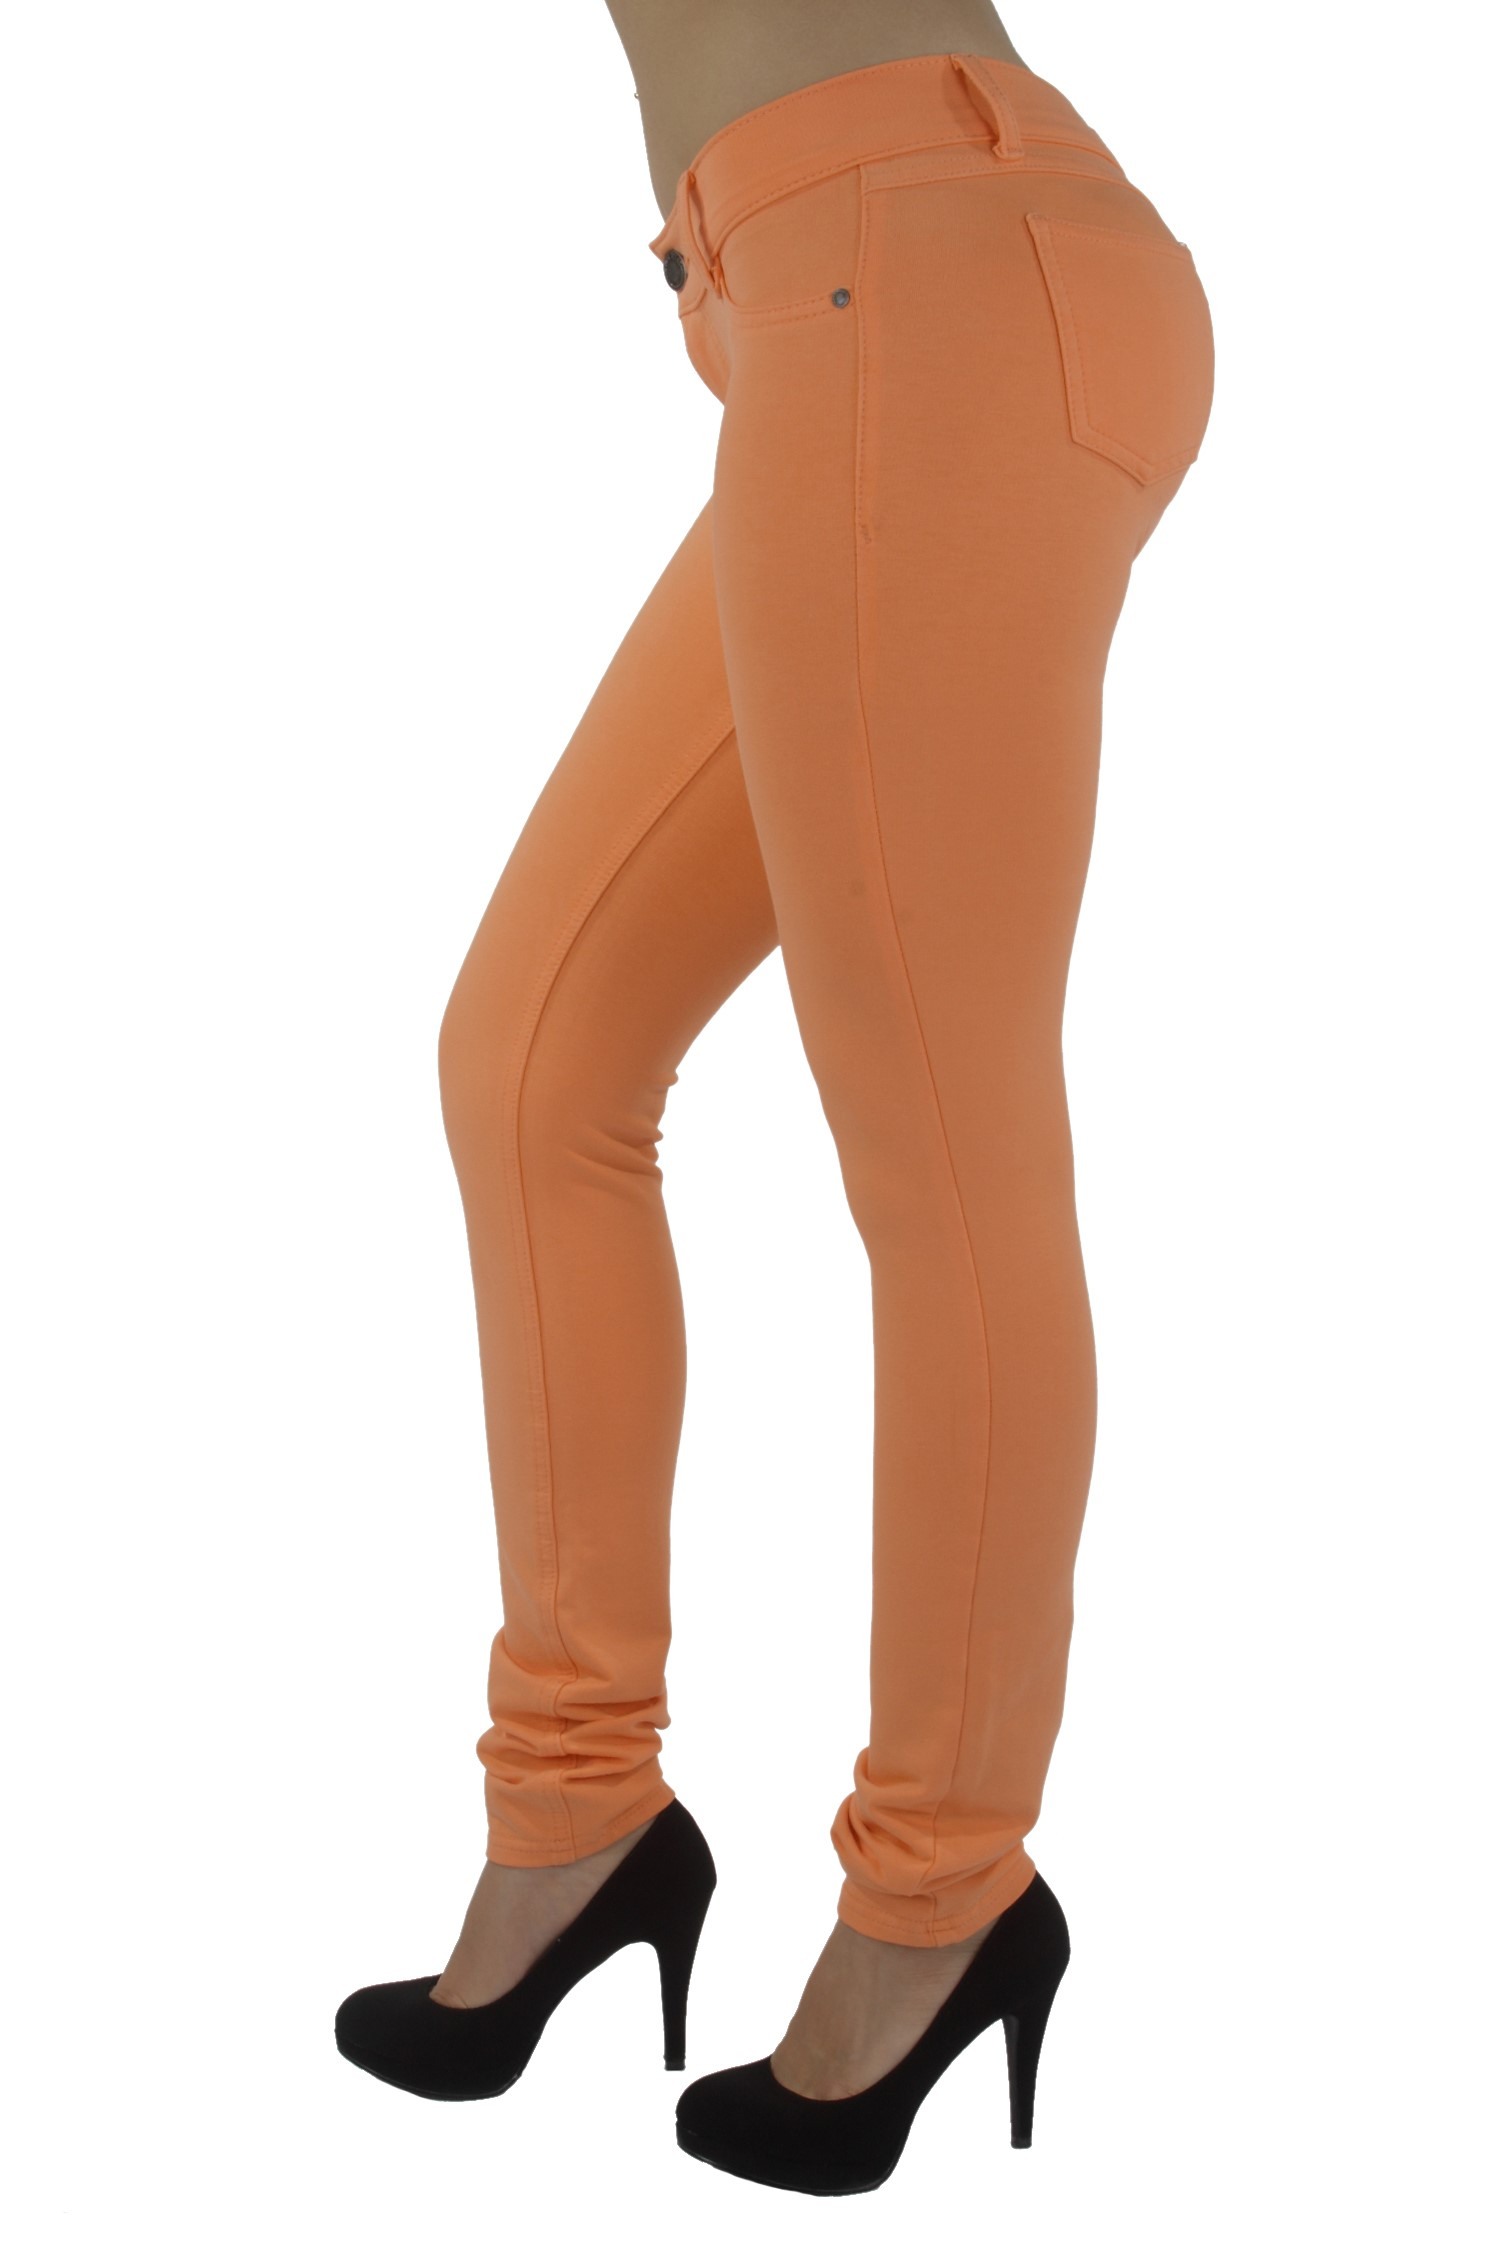 U-Turn Jeans Basic Skinny Leg Super Stretch Premium Cotton -1938